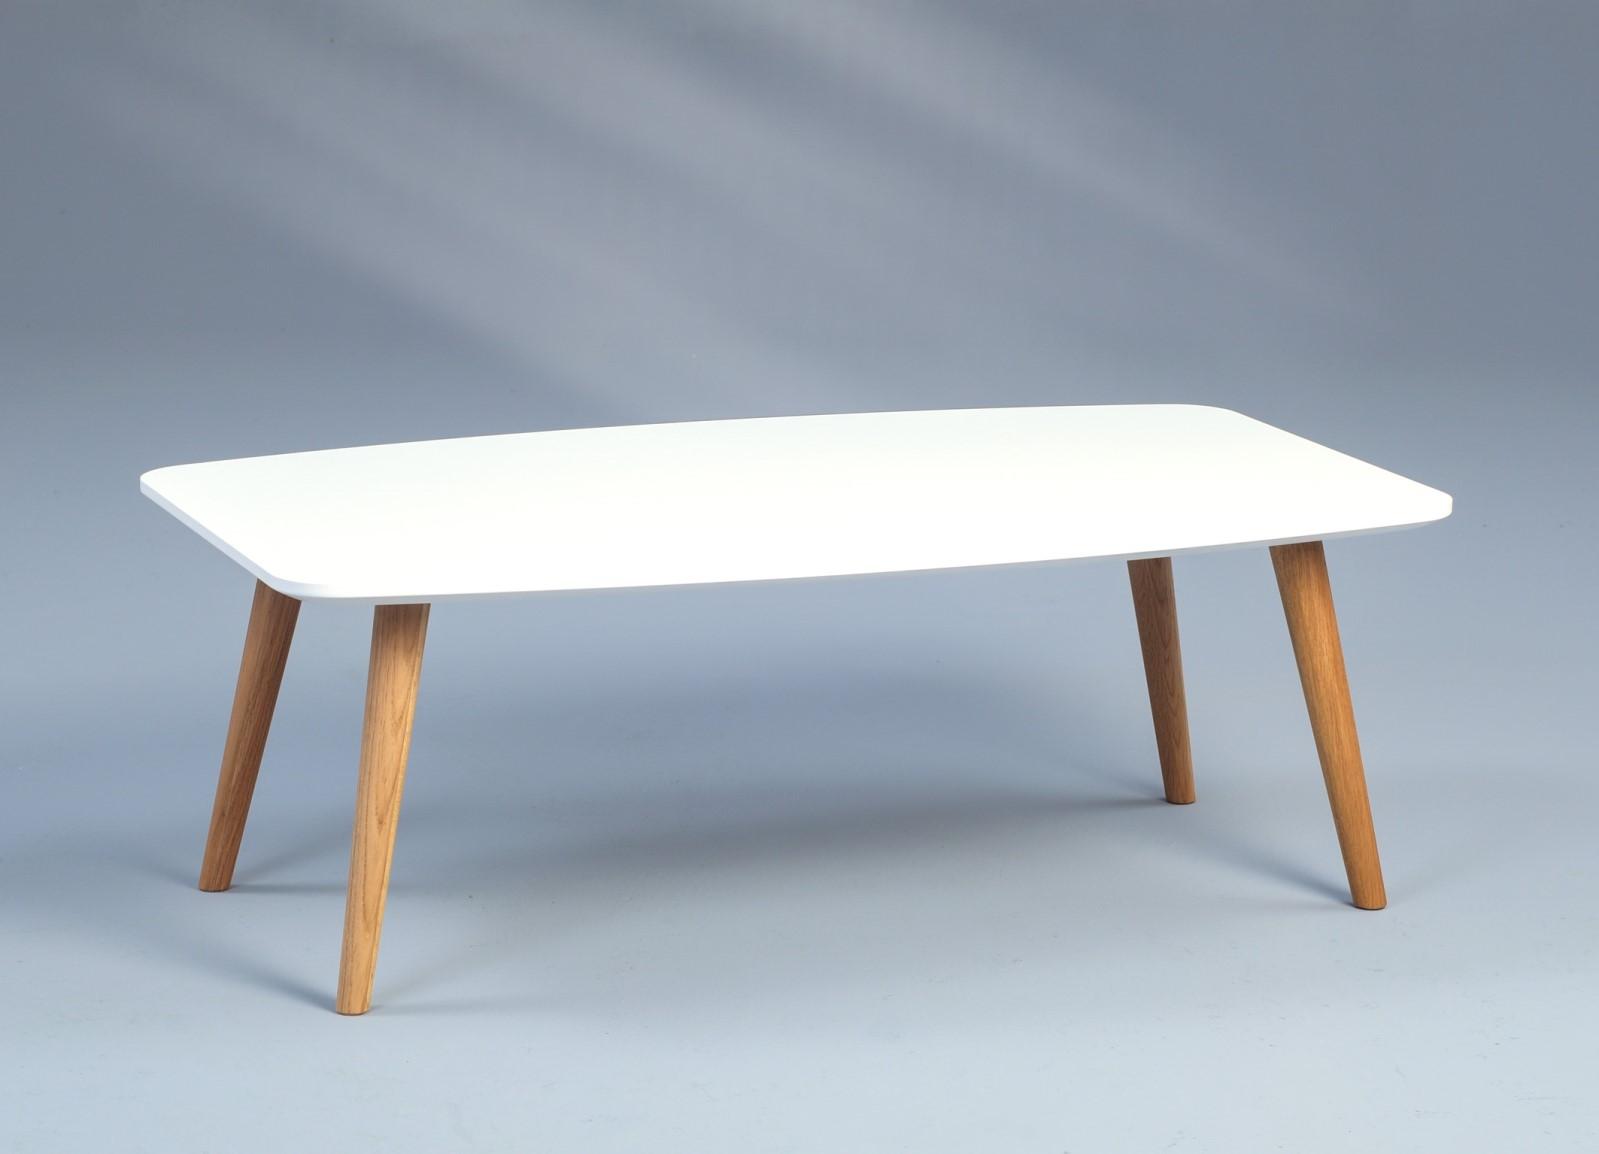 Couchtisch tisch este 90x60 cm weiss betonoptik ebay - Couchtisch 90x60 ...